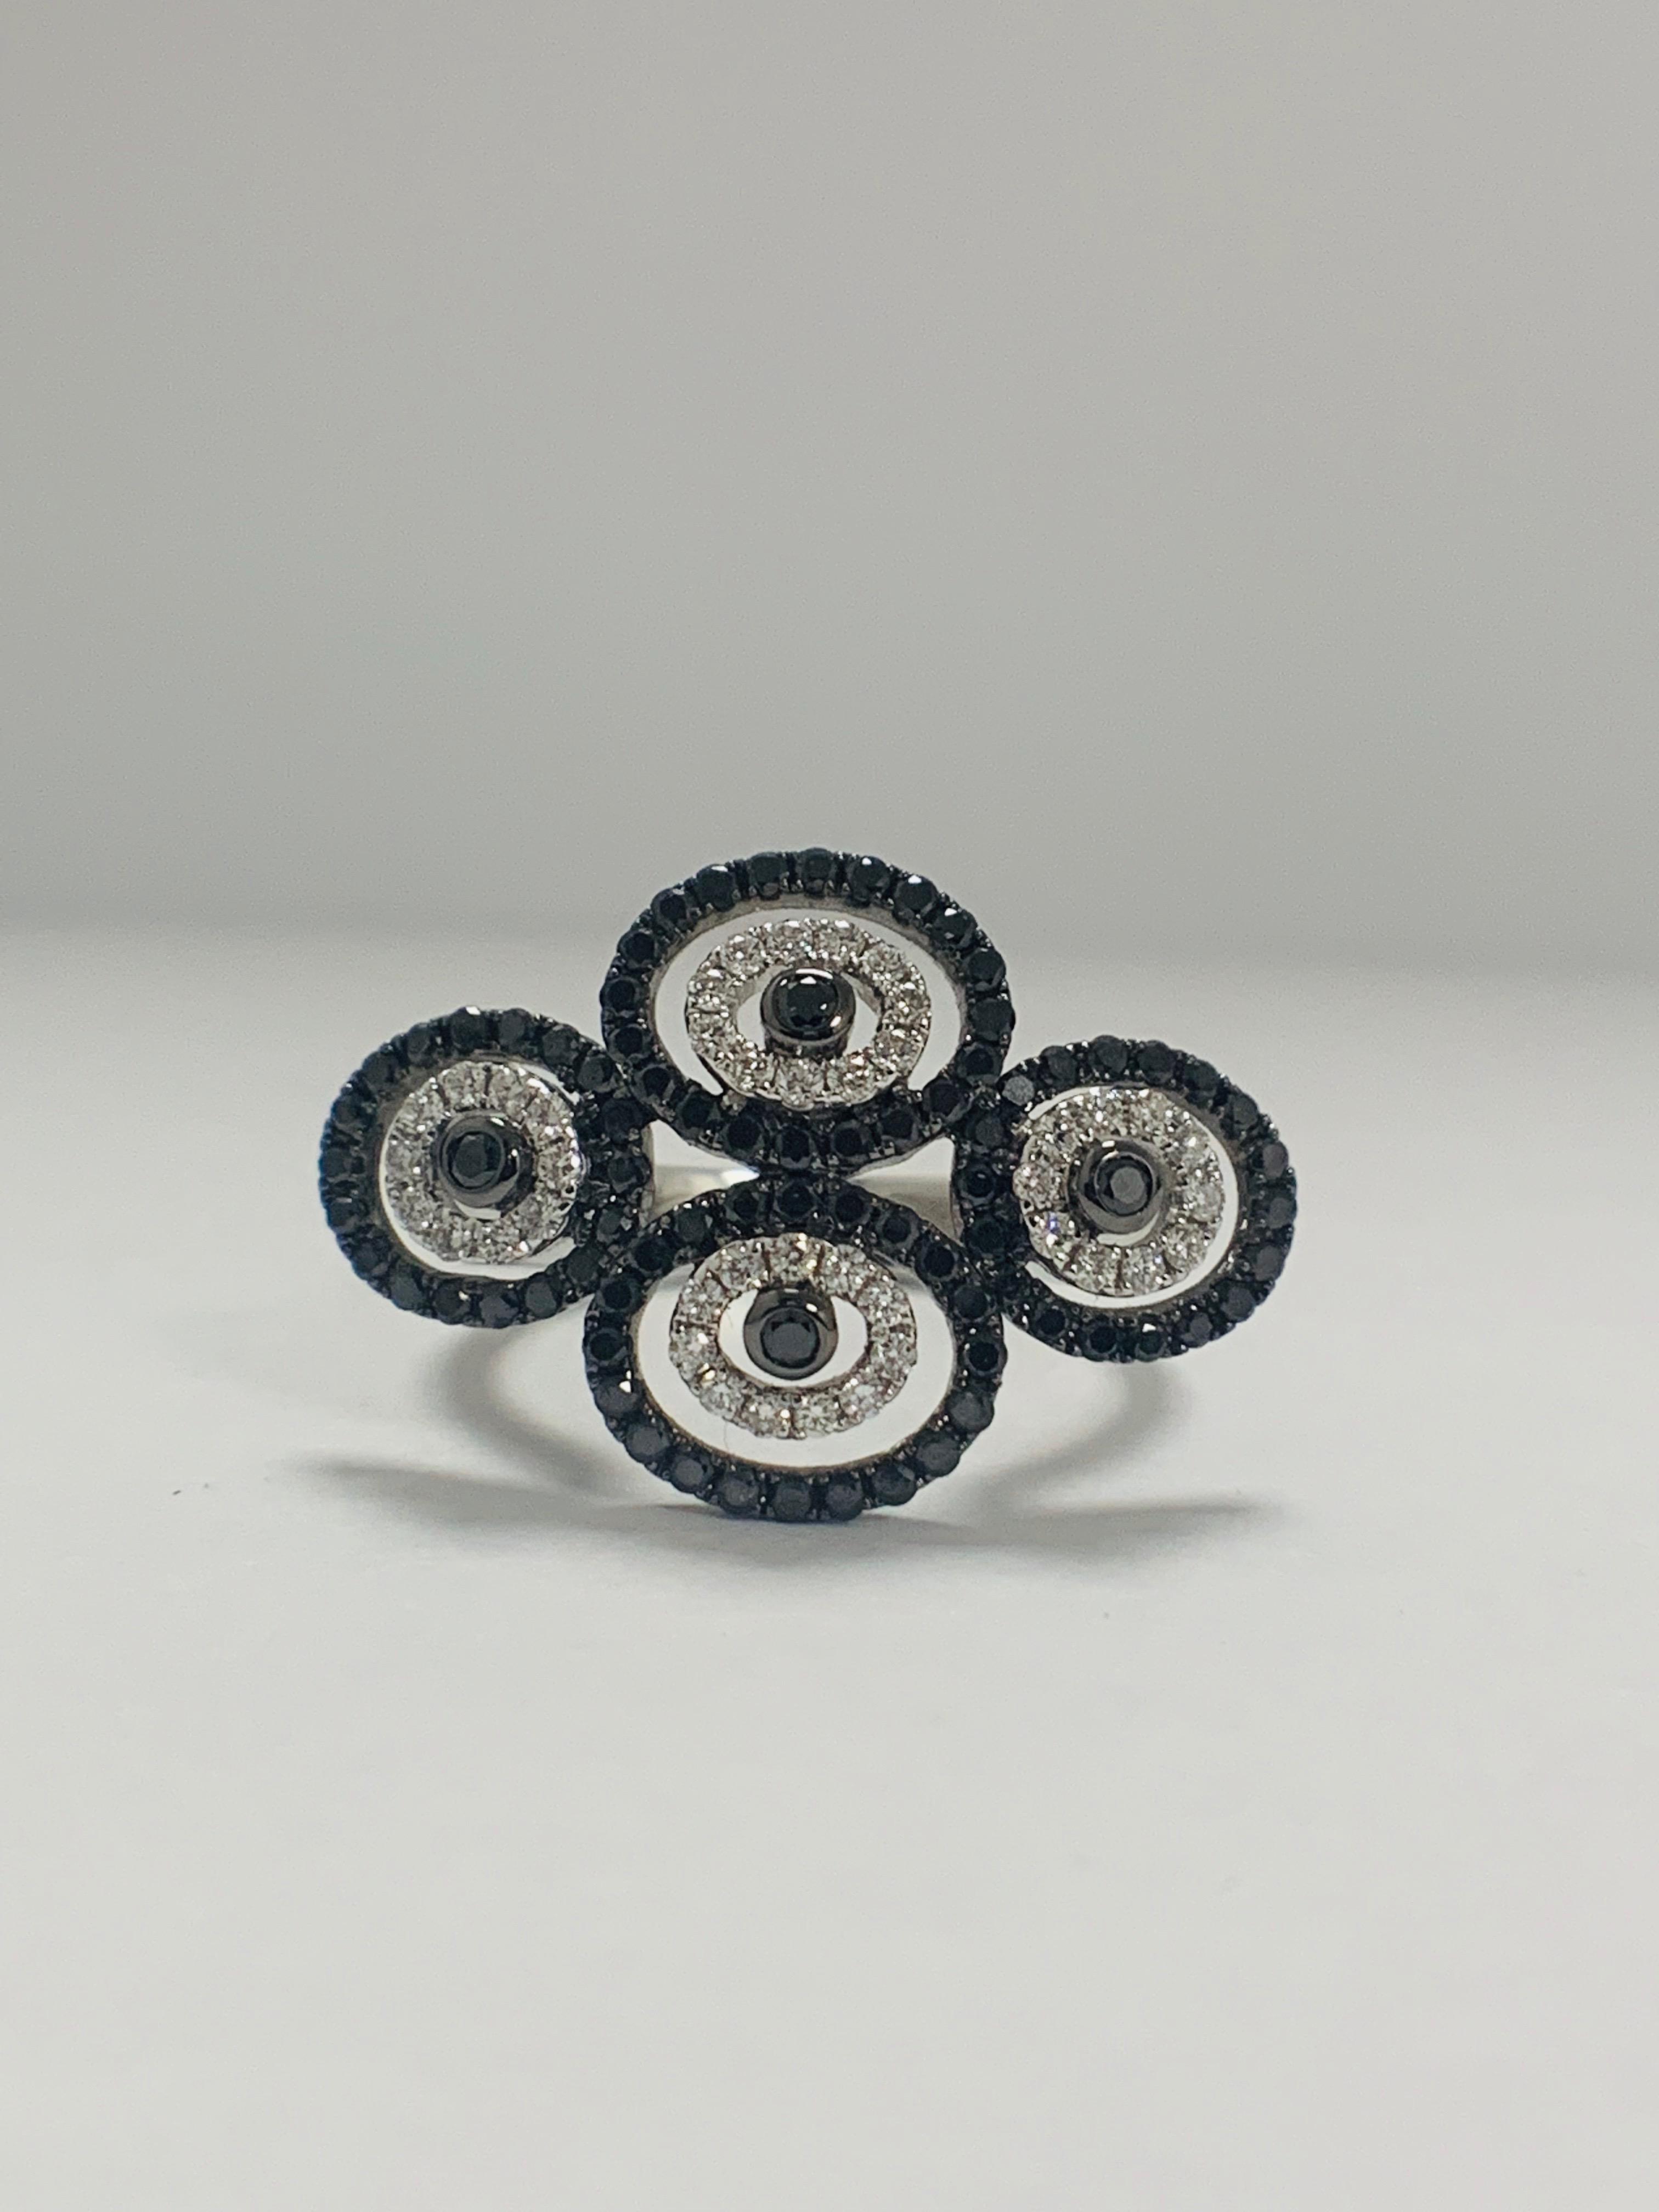 18ct White Gold Diamond ring featuring 80 round cut, black Diamonds (0.61ct TBDW)